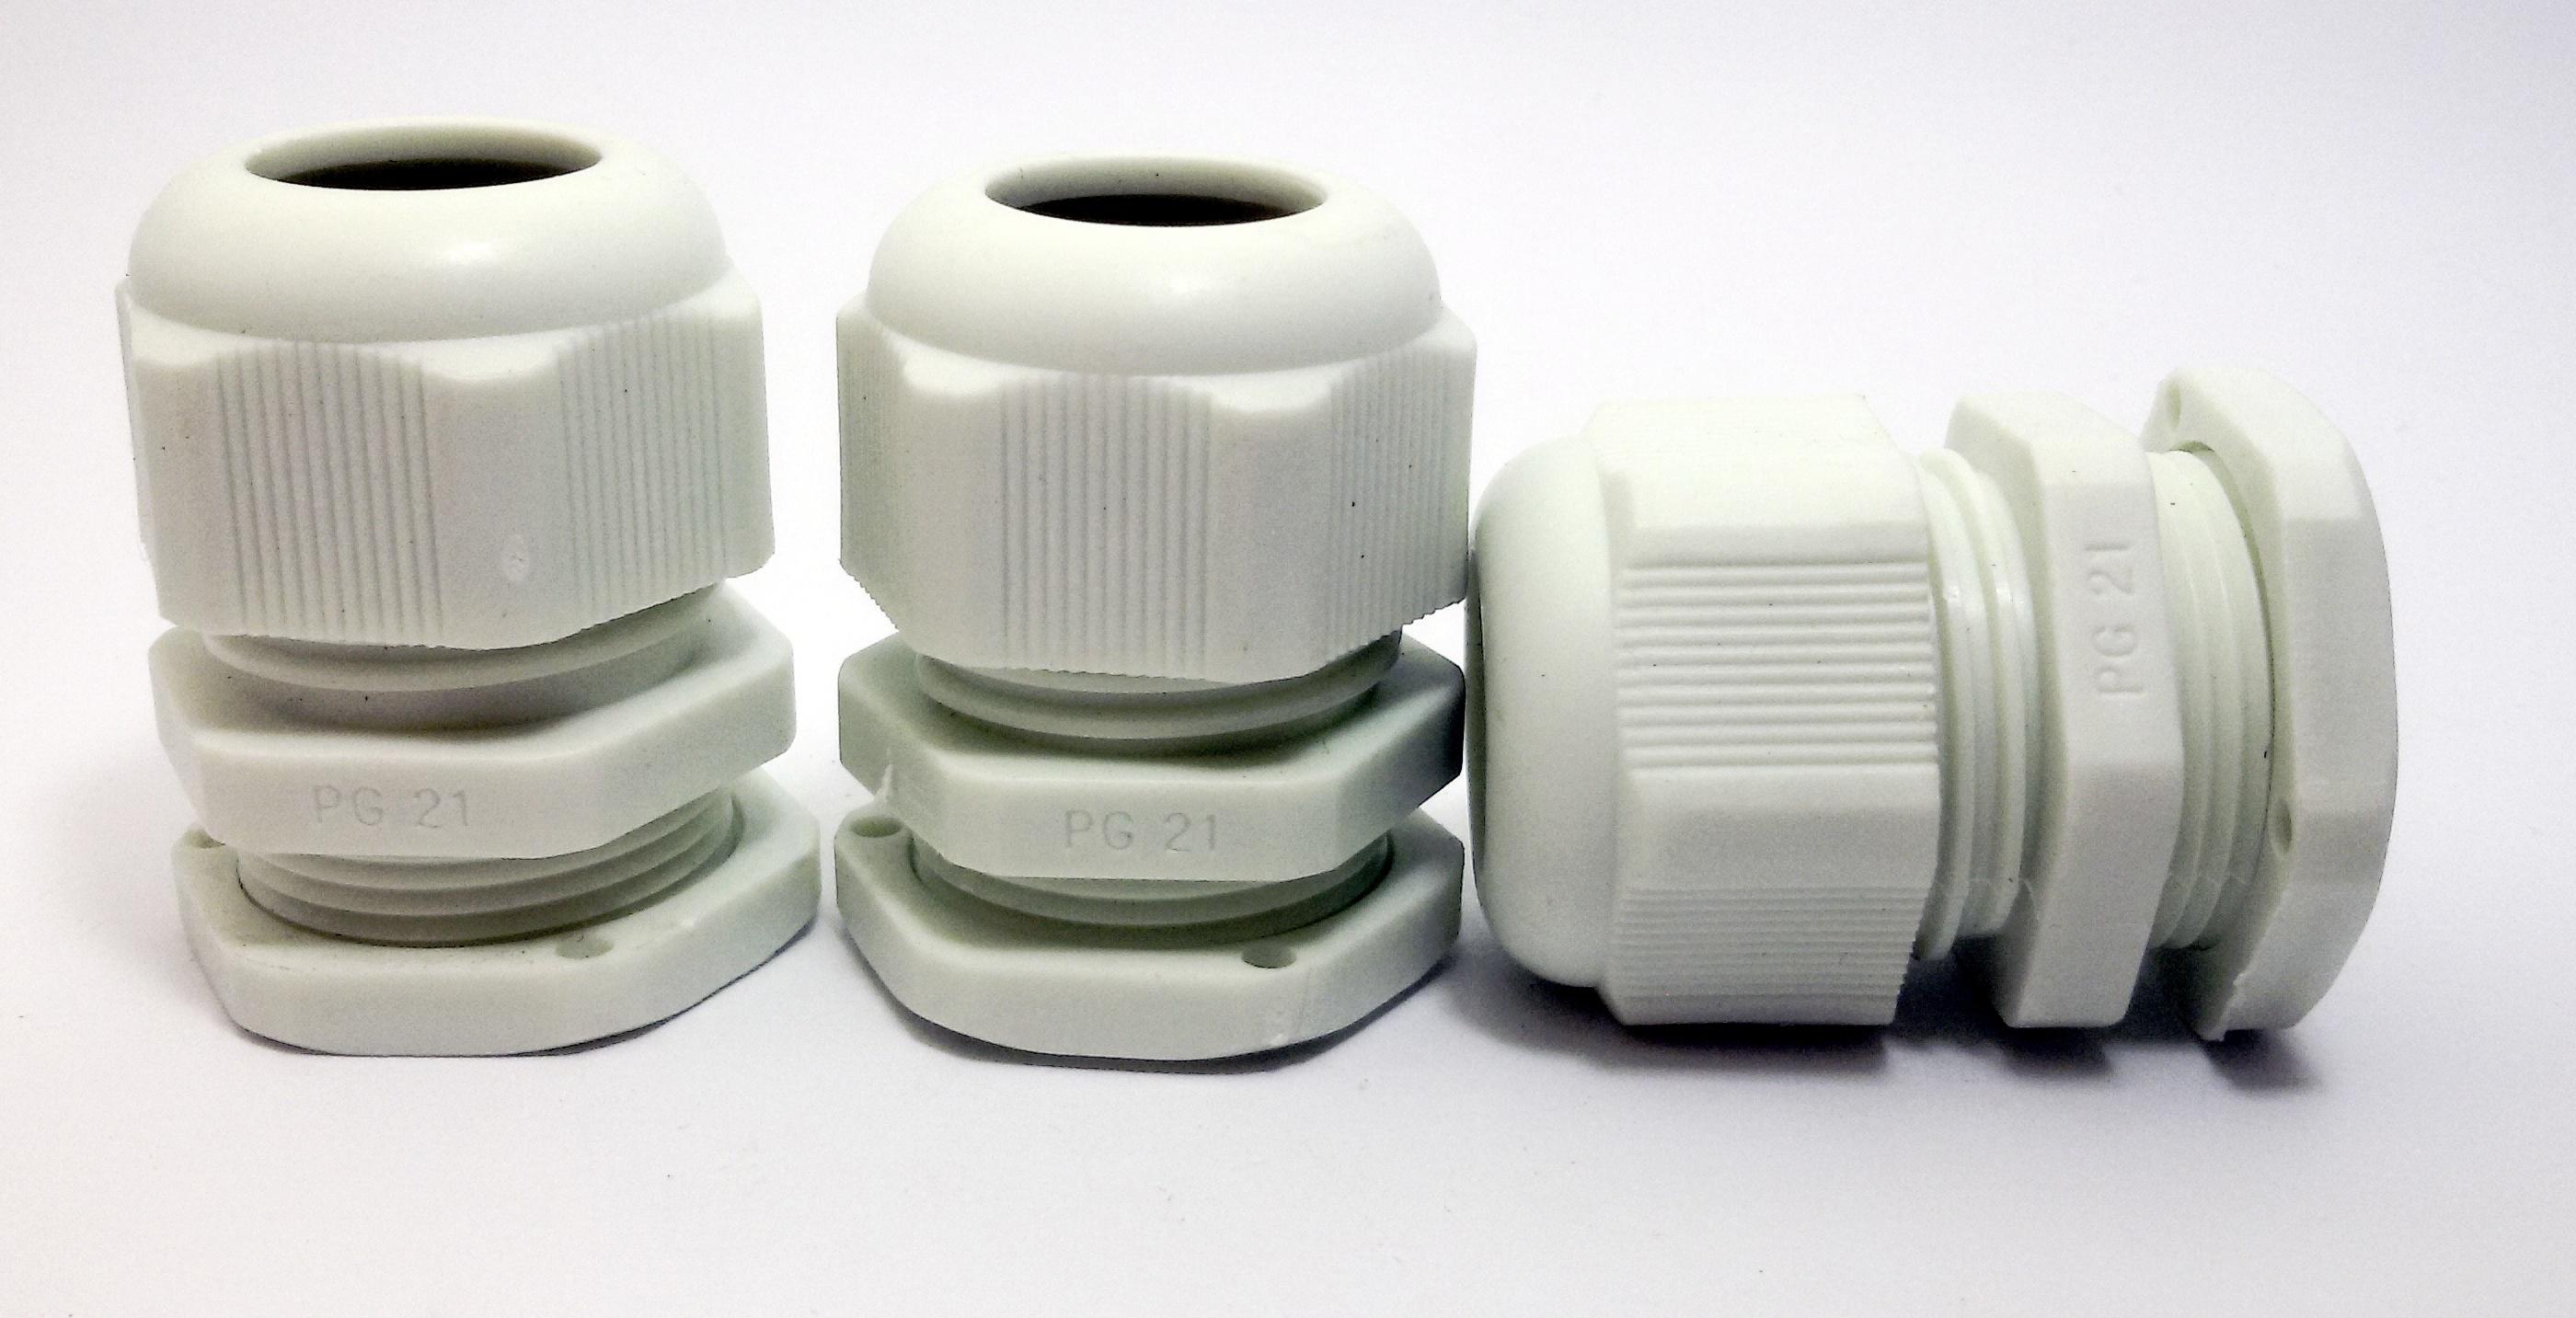 LOBO ELECTRIC CABLE GLAND PG21 13 -18 mm. สีขาว